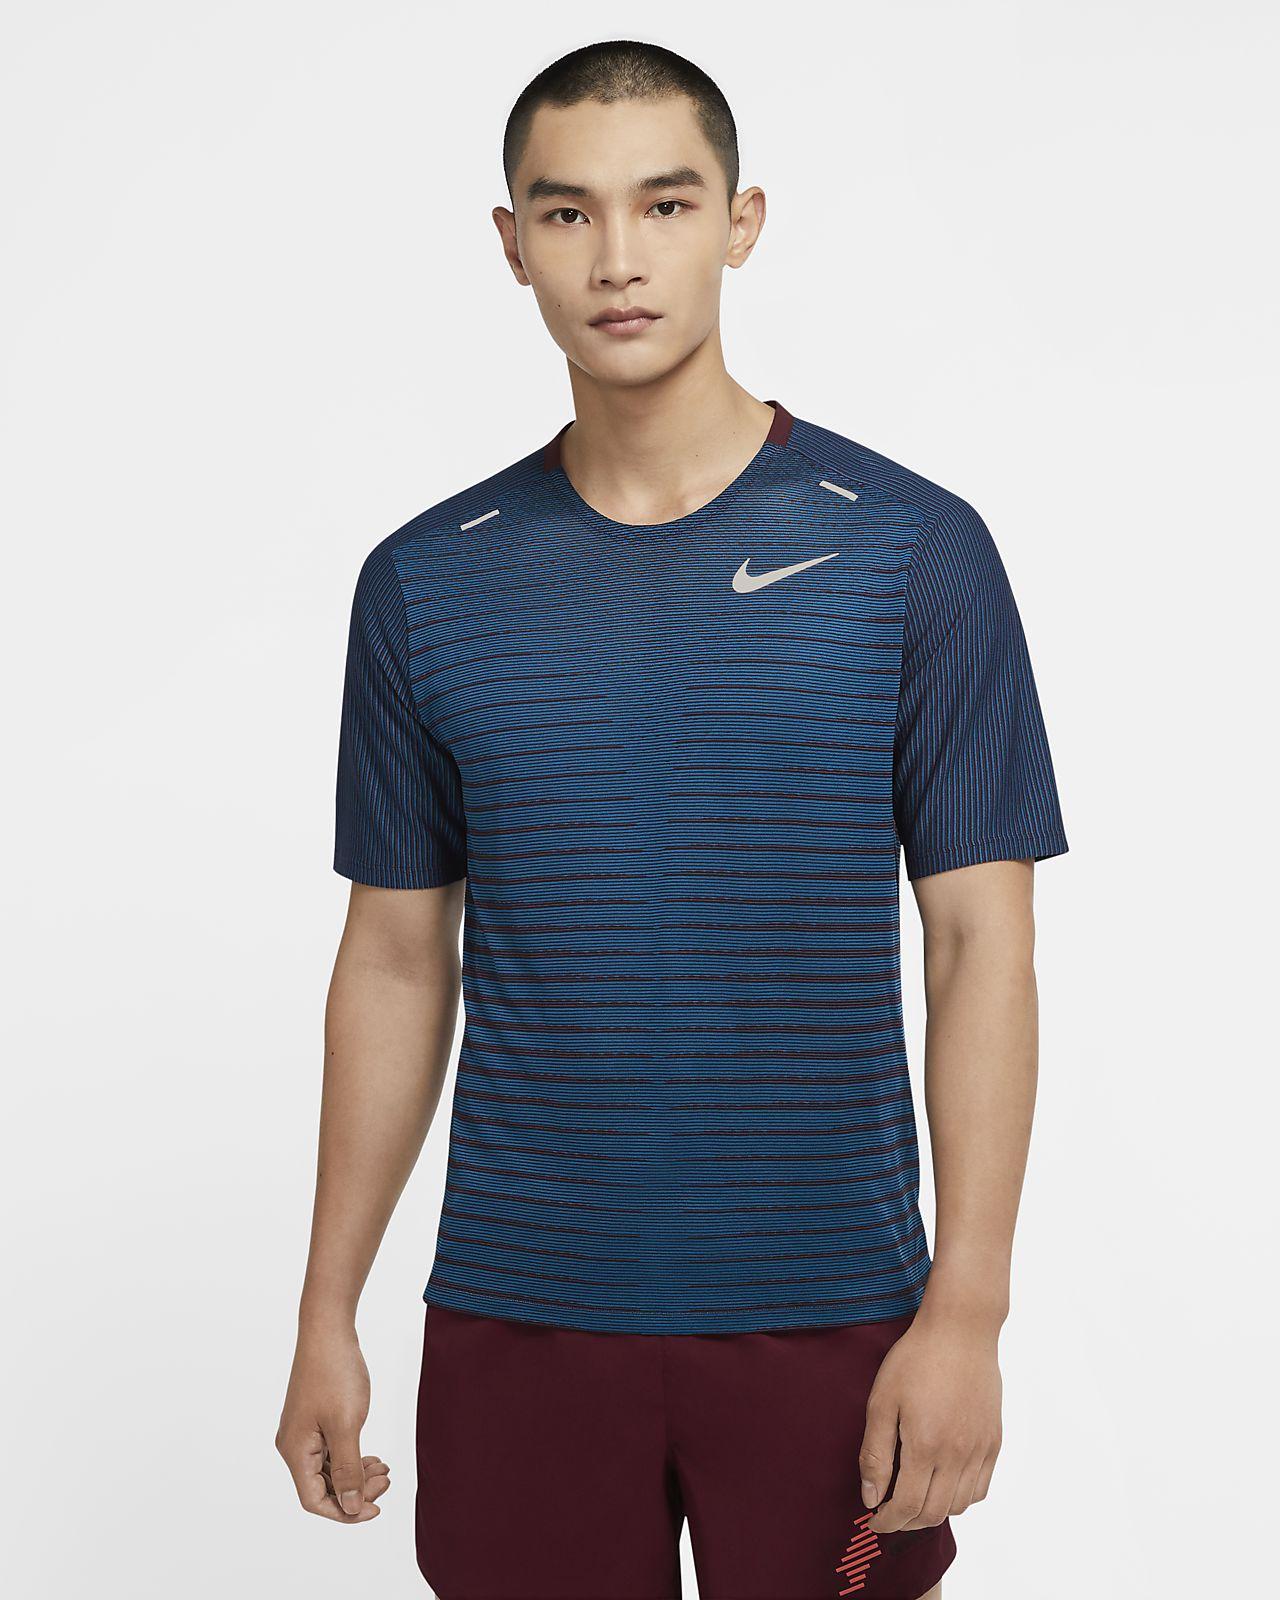 Мужская беговая футболка Nike TechKnit Future Fast